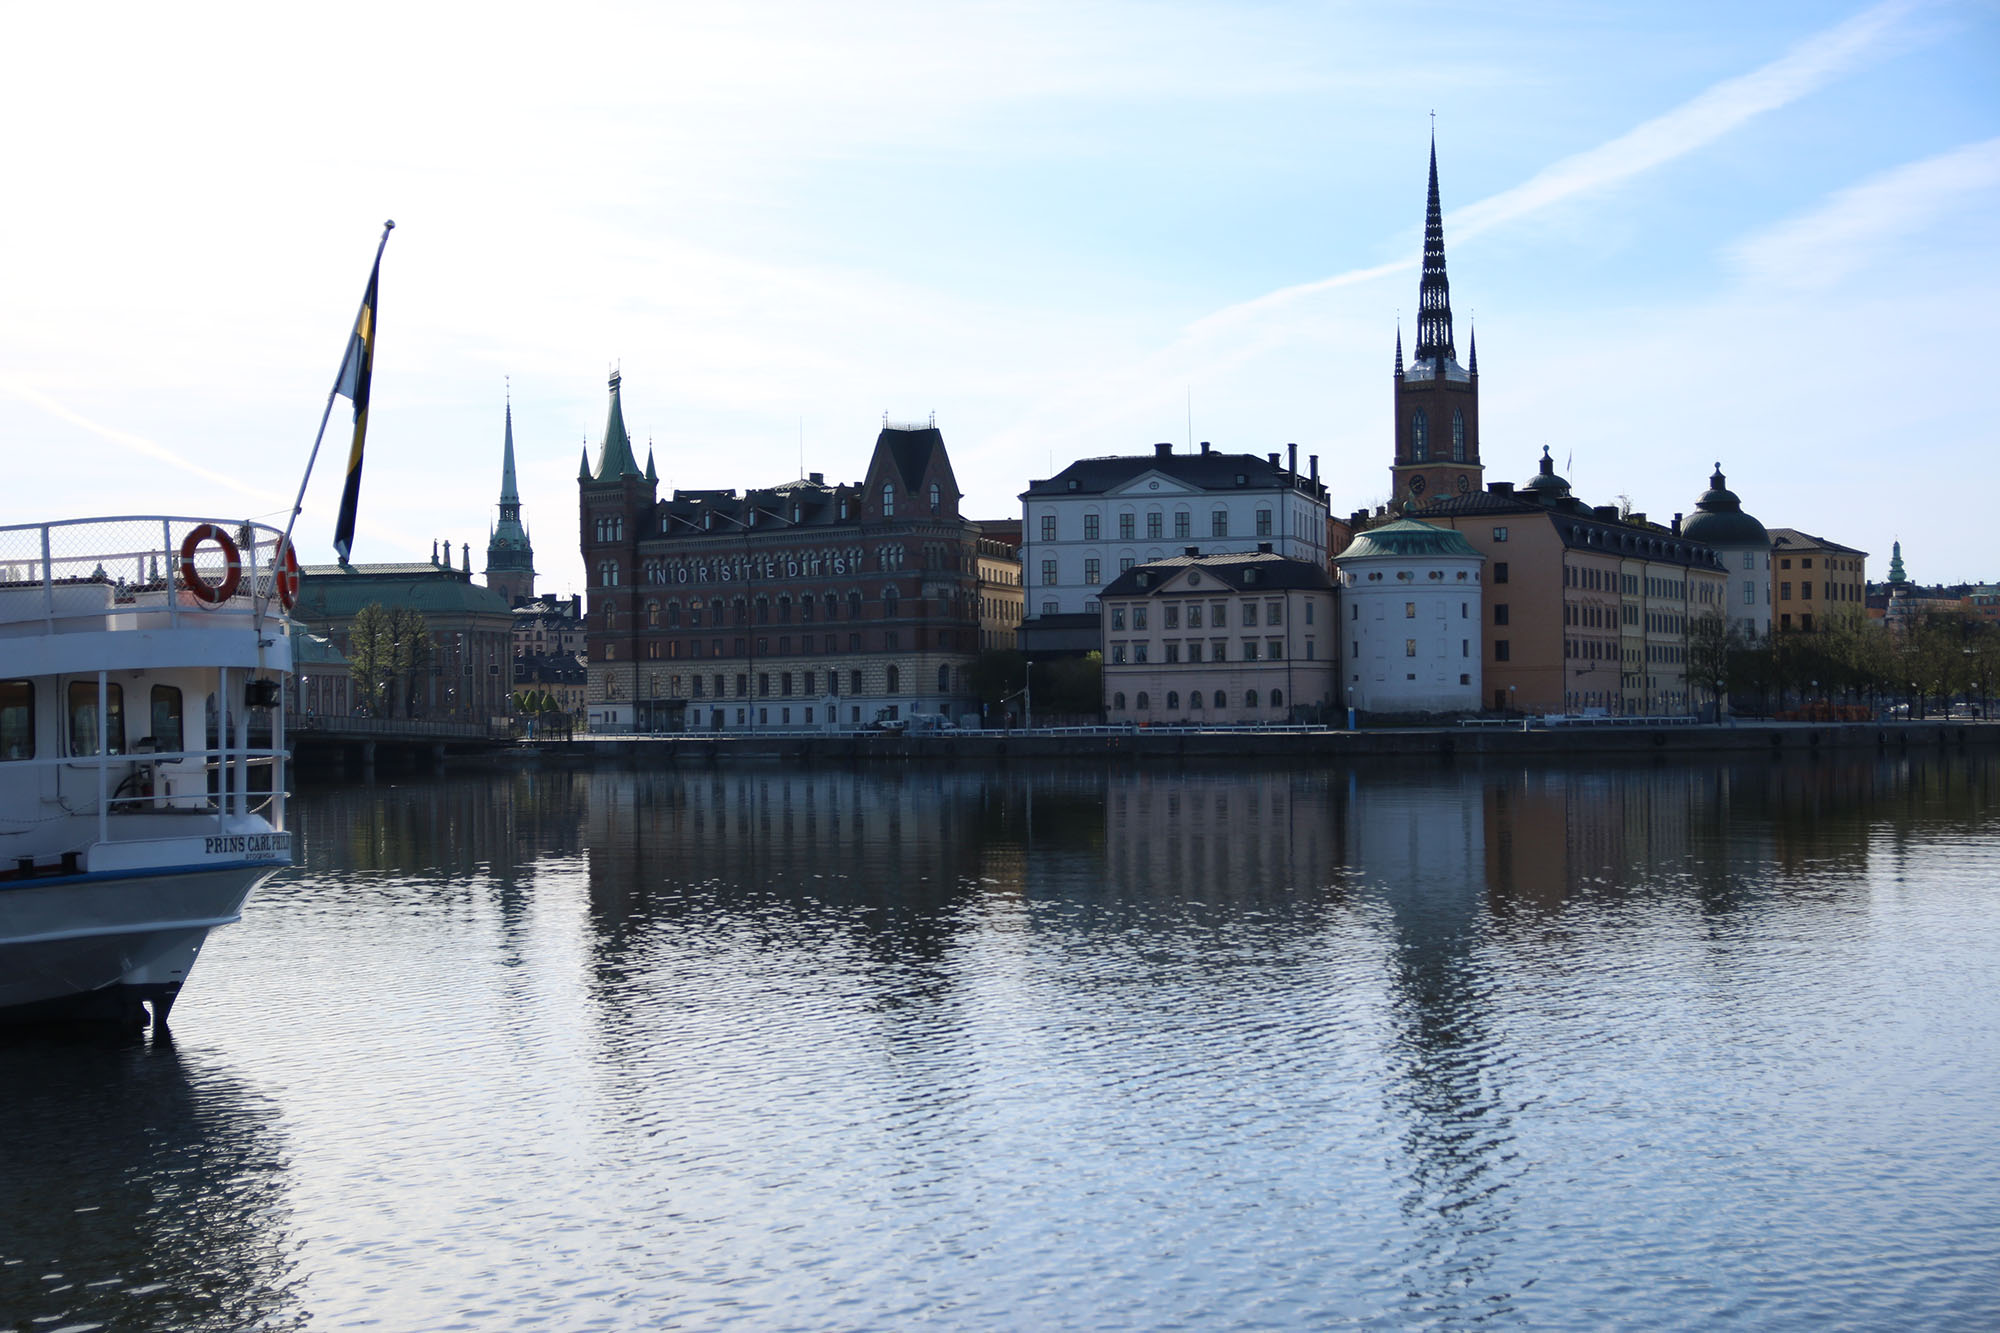 IMG_2955 stockholmshelg x